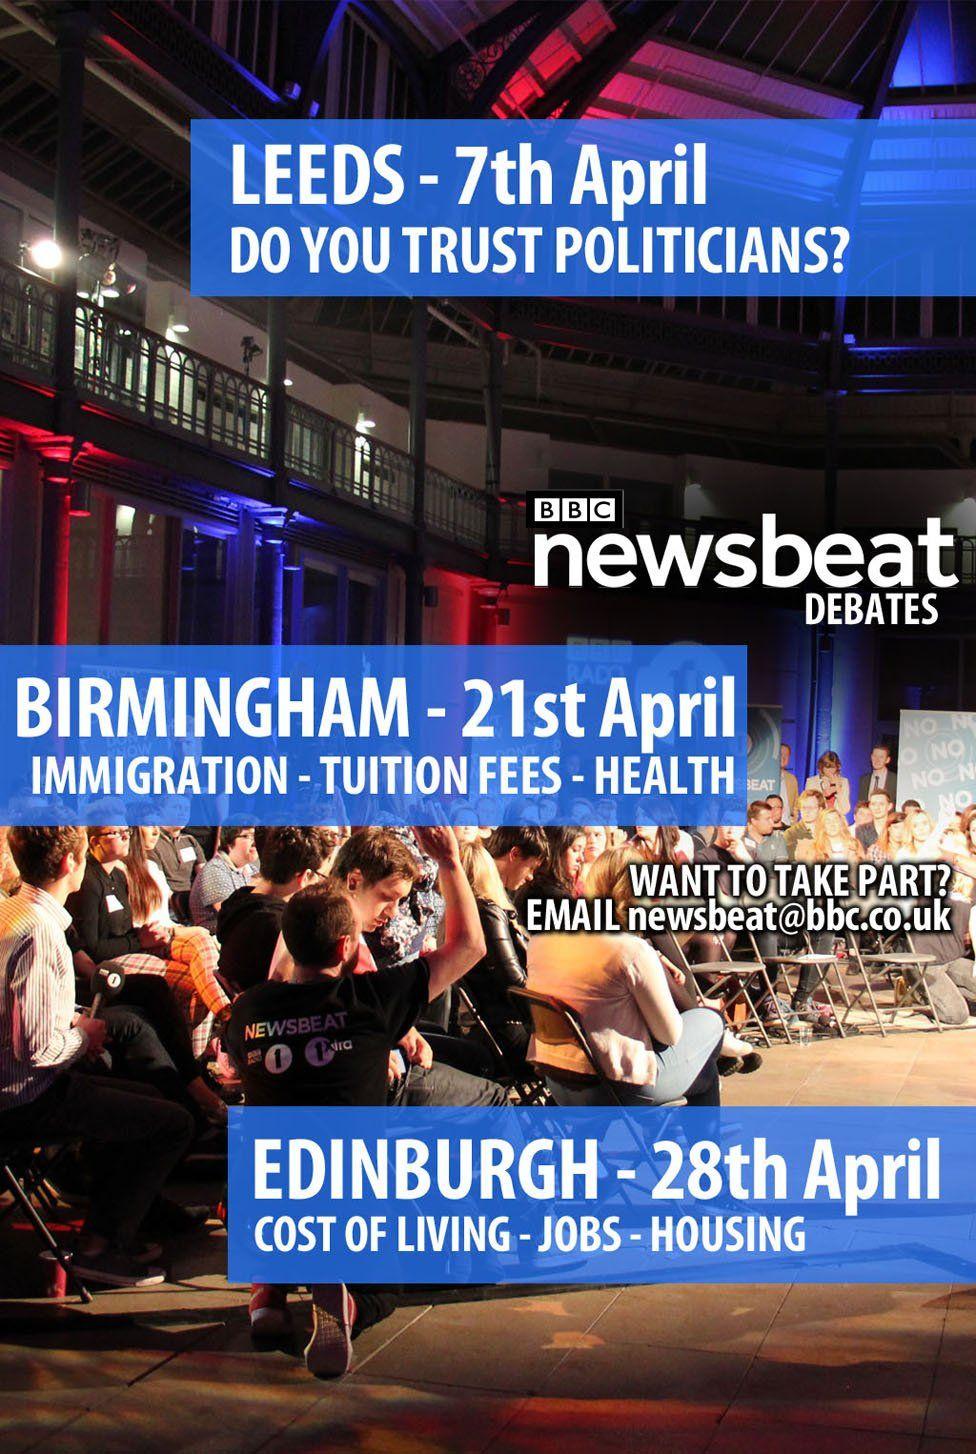 Newsbeat debates